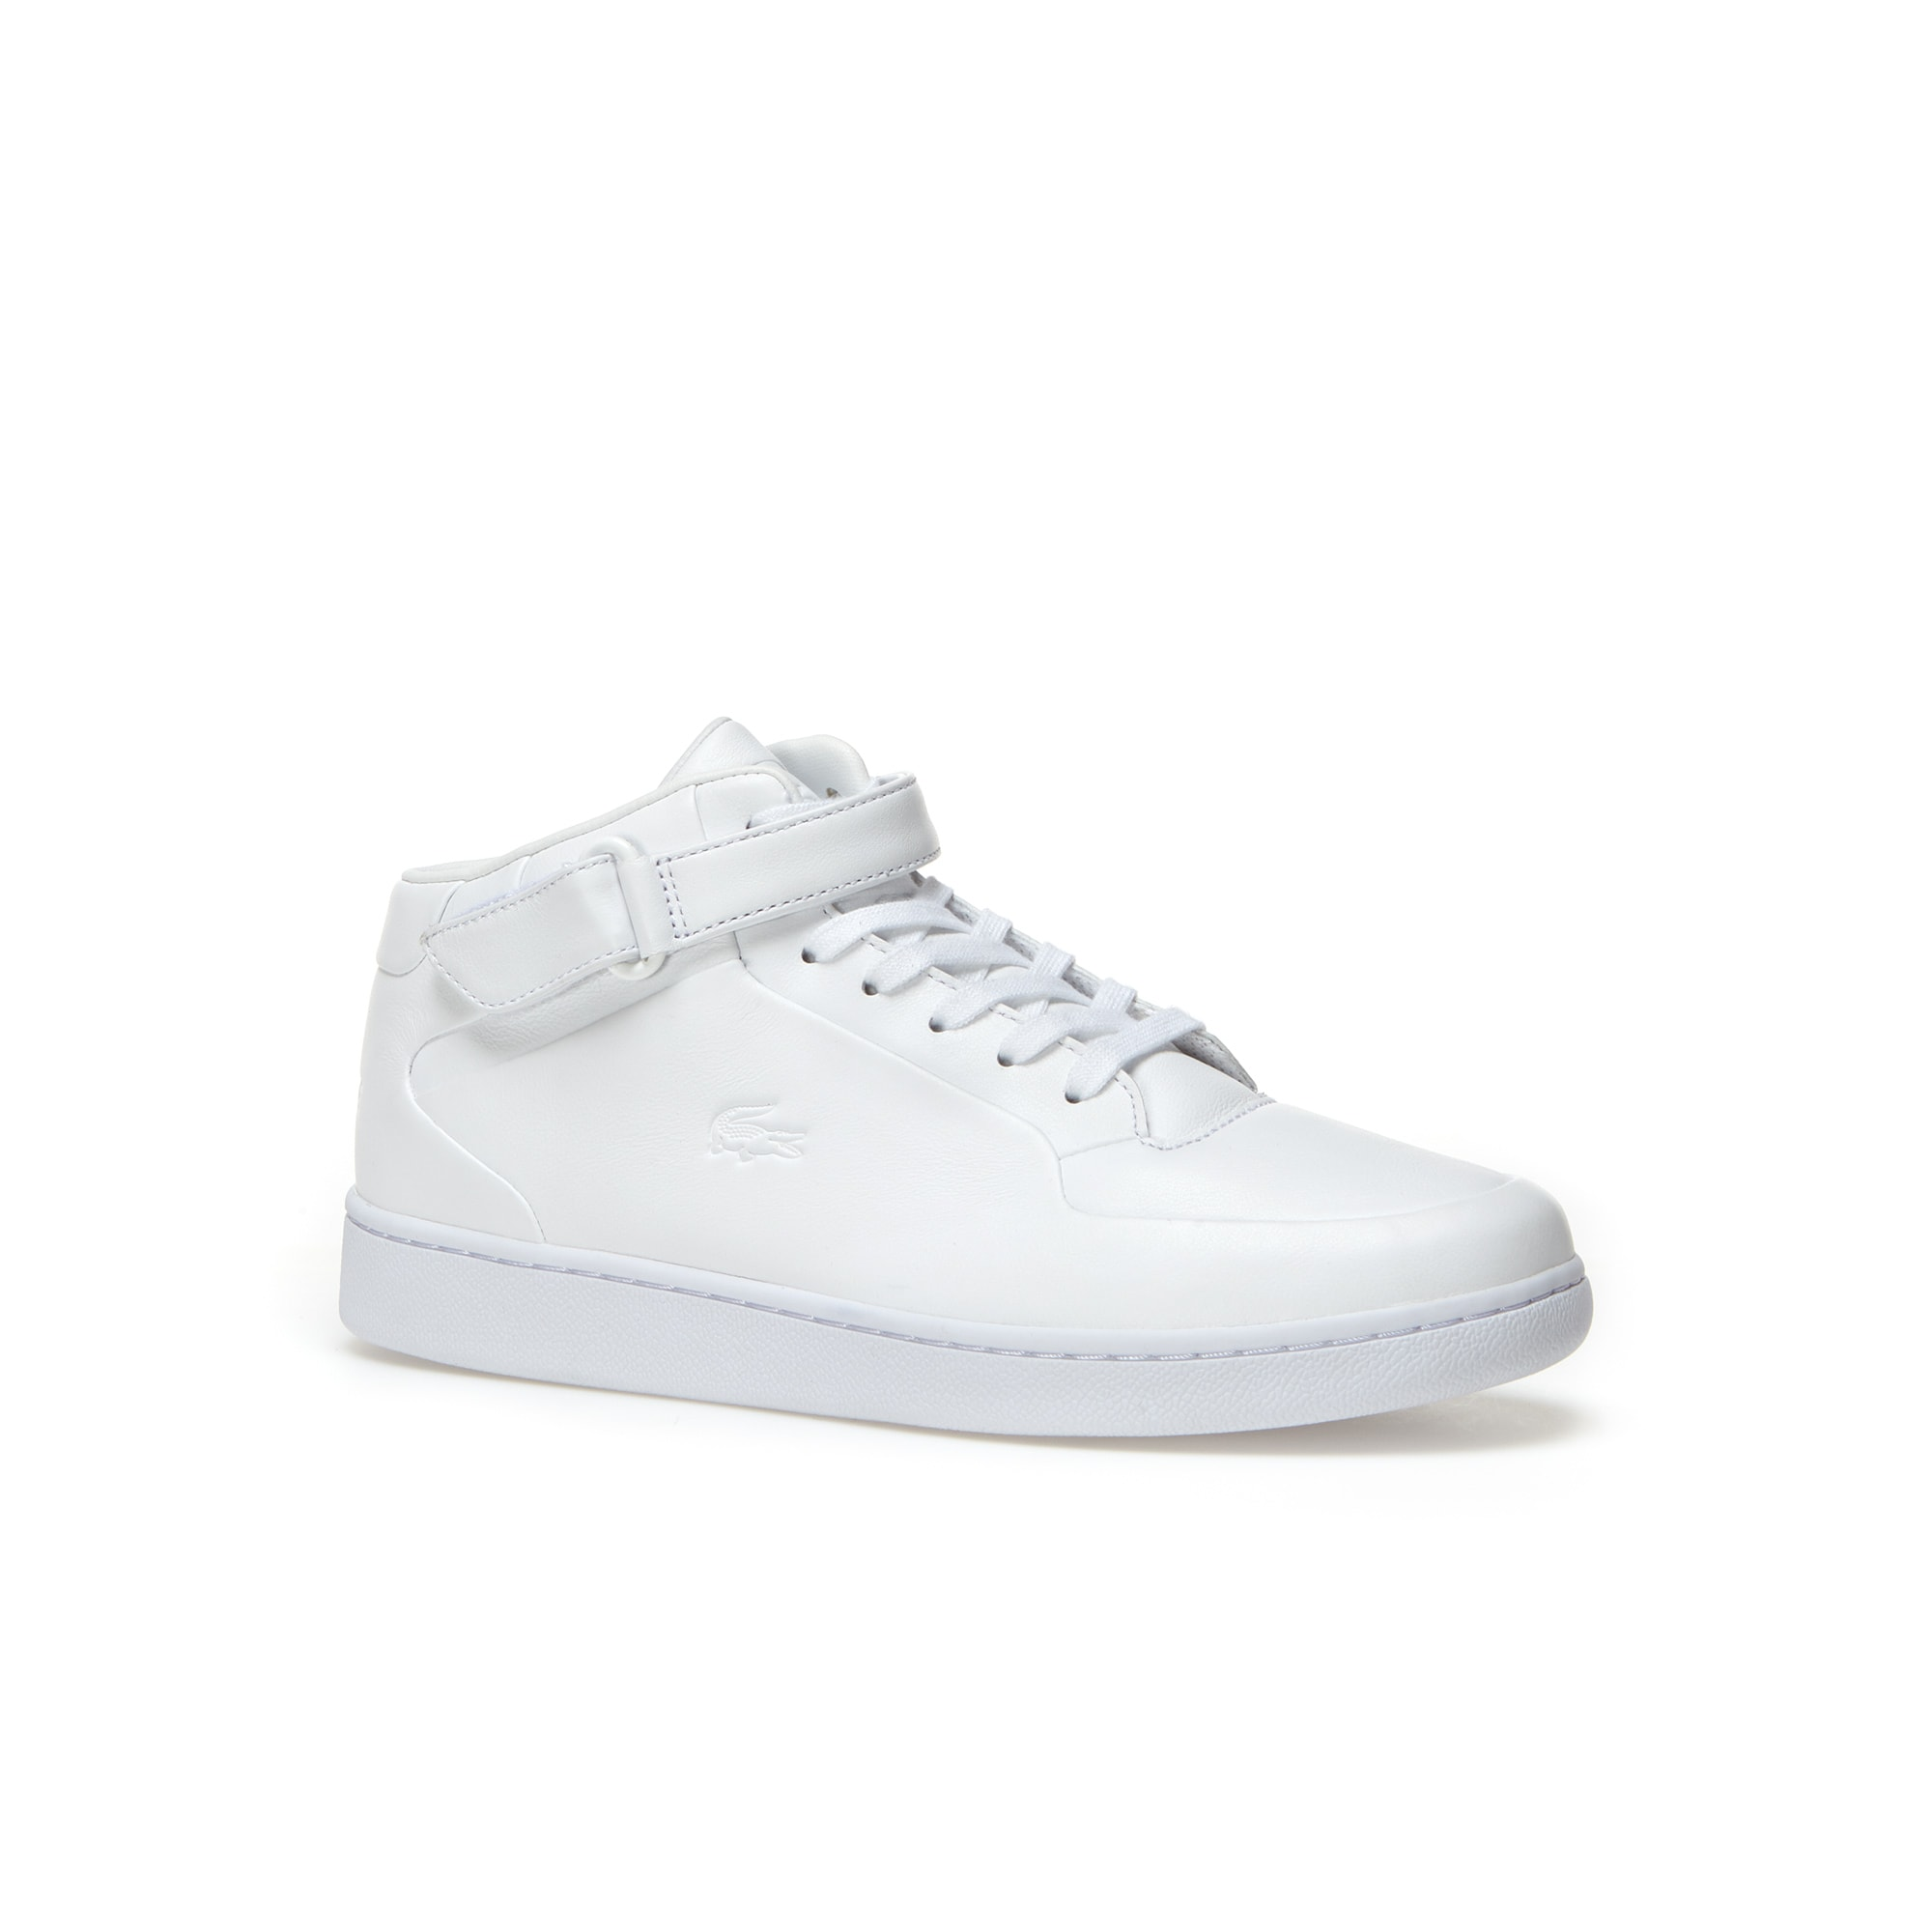 Men's Turbo Sneakers